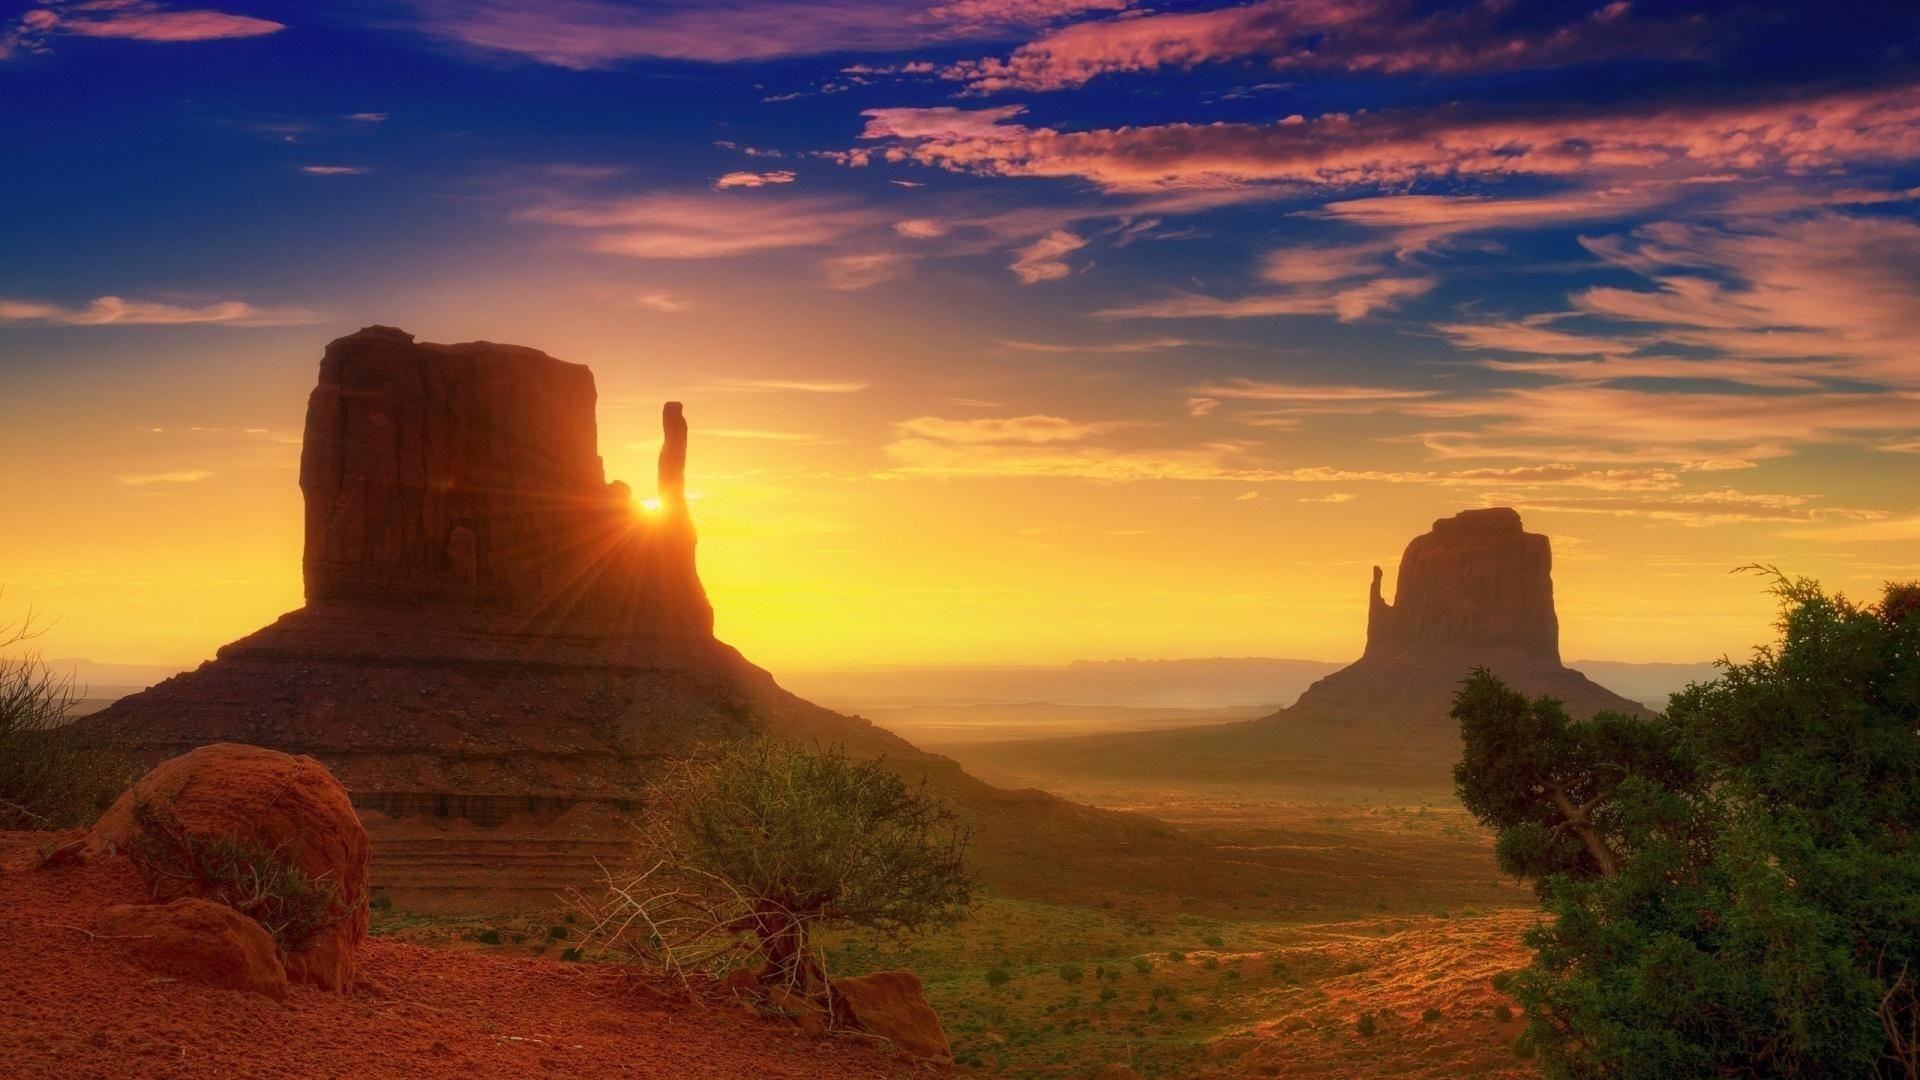 Hd Superior Desert Sunset Wallpaper Grand Canyon Sunrise Monument Valley Arizona Sunset